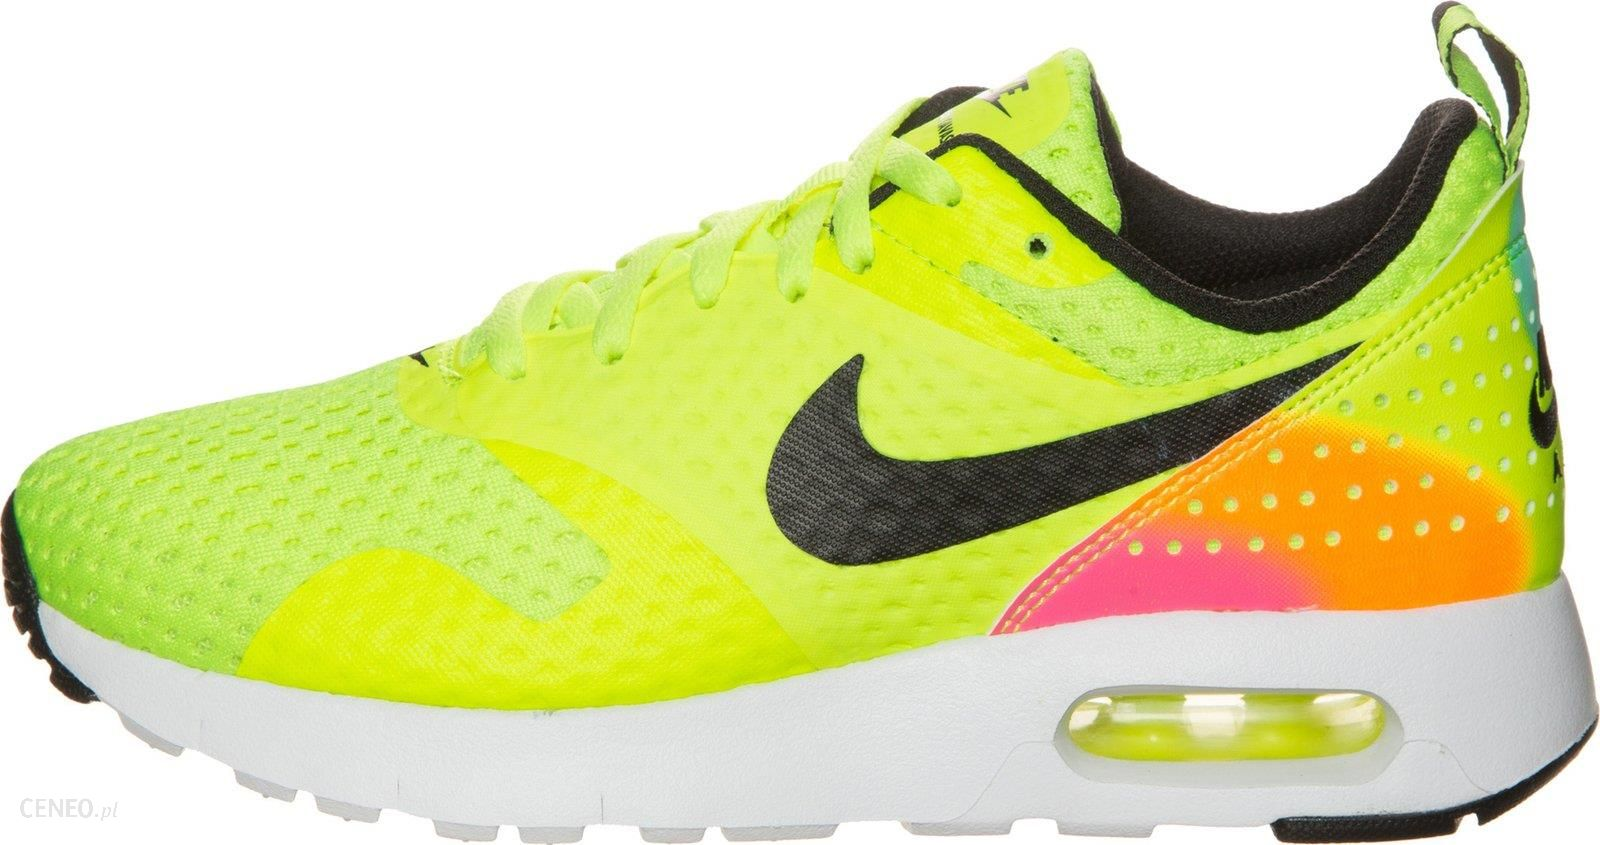 Buty Meskie Nike Air Max Tavas Fb 845112 700 r.38 Ceny i opinie Ceneo.pl